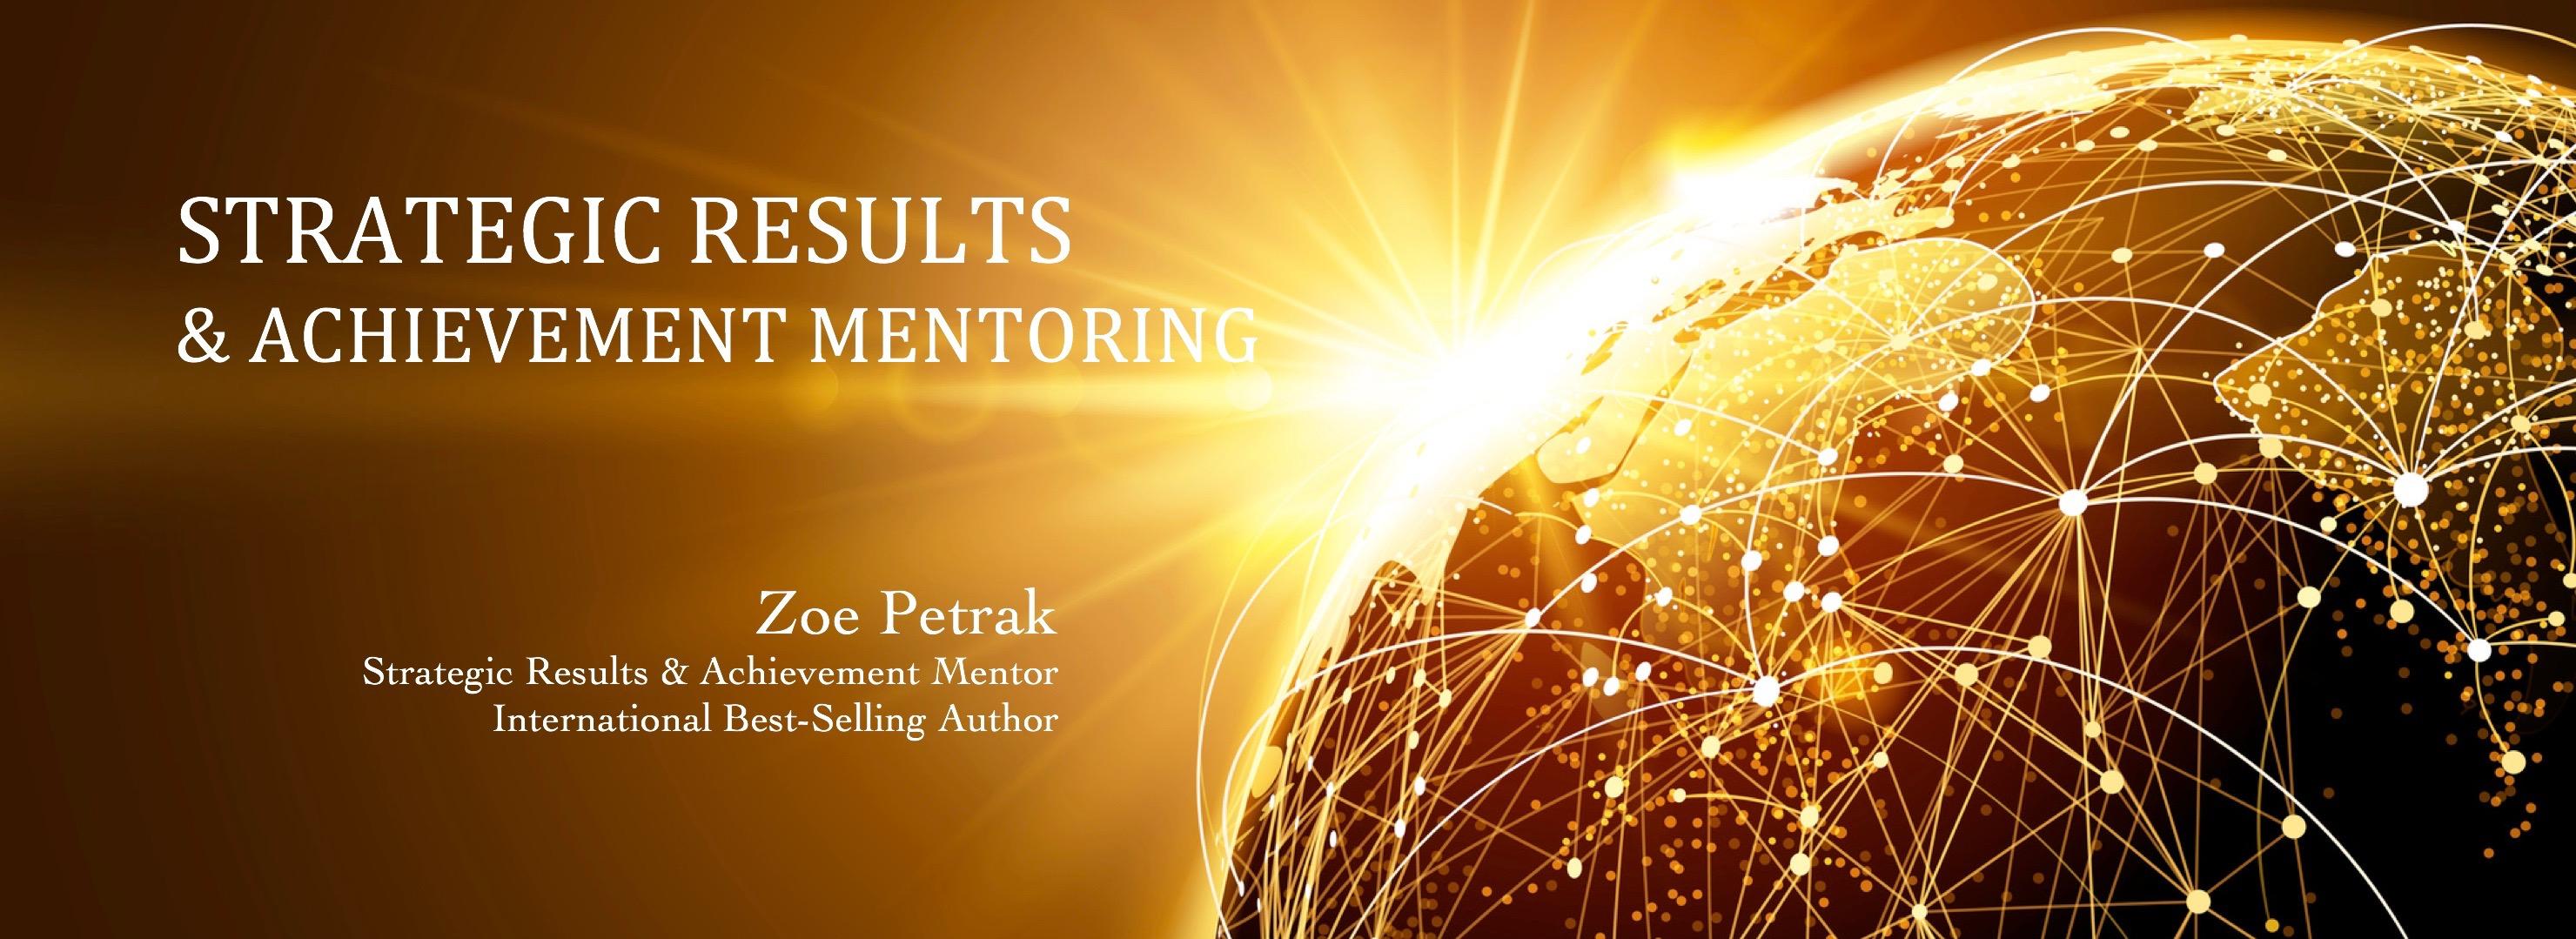 Zoe-Petrak-Speaker-Mentor-Coach